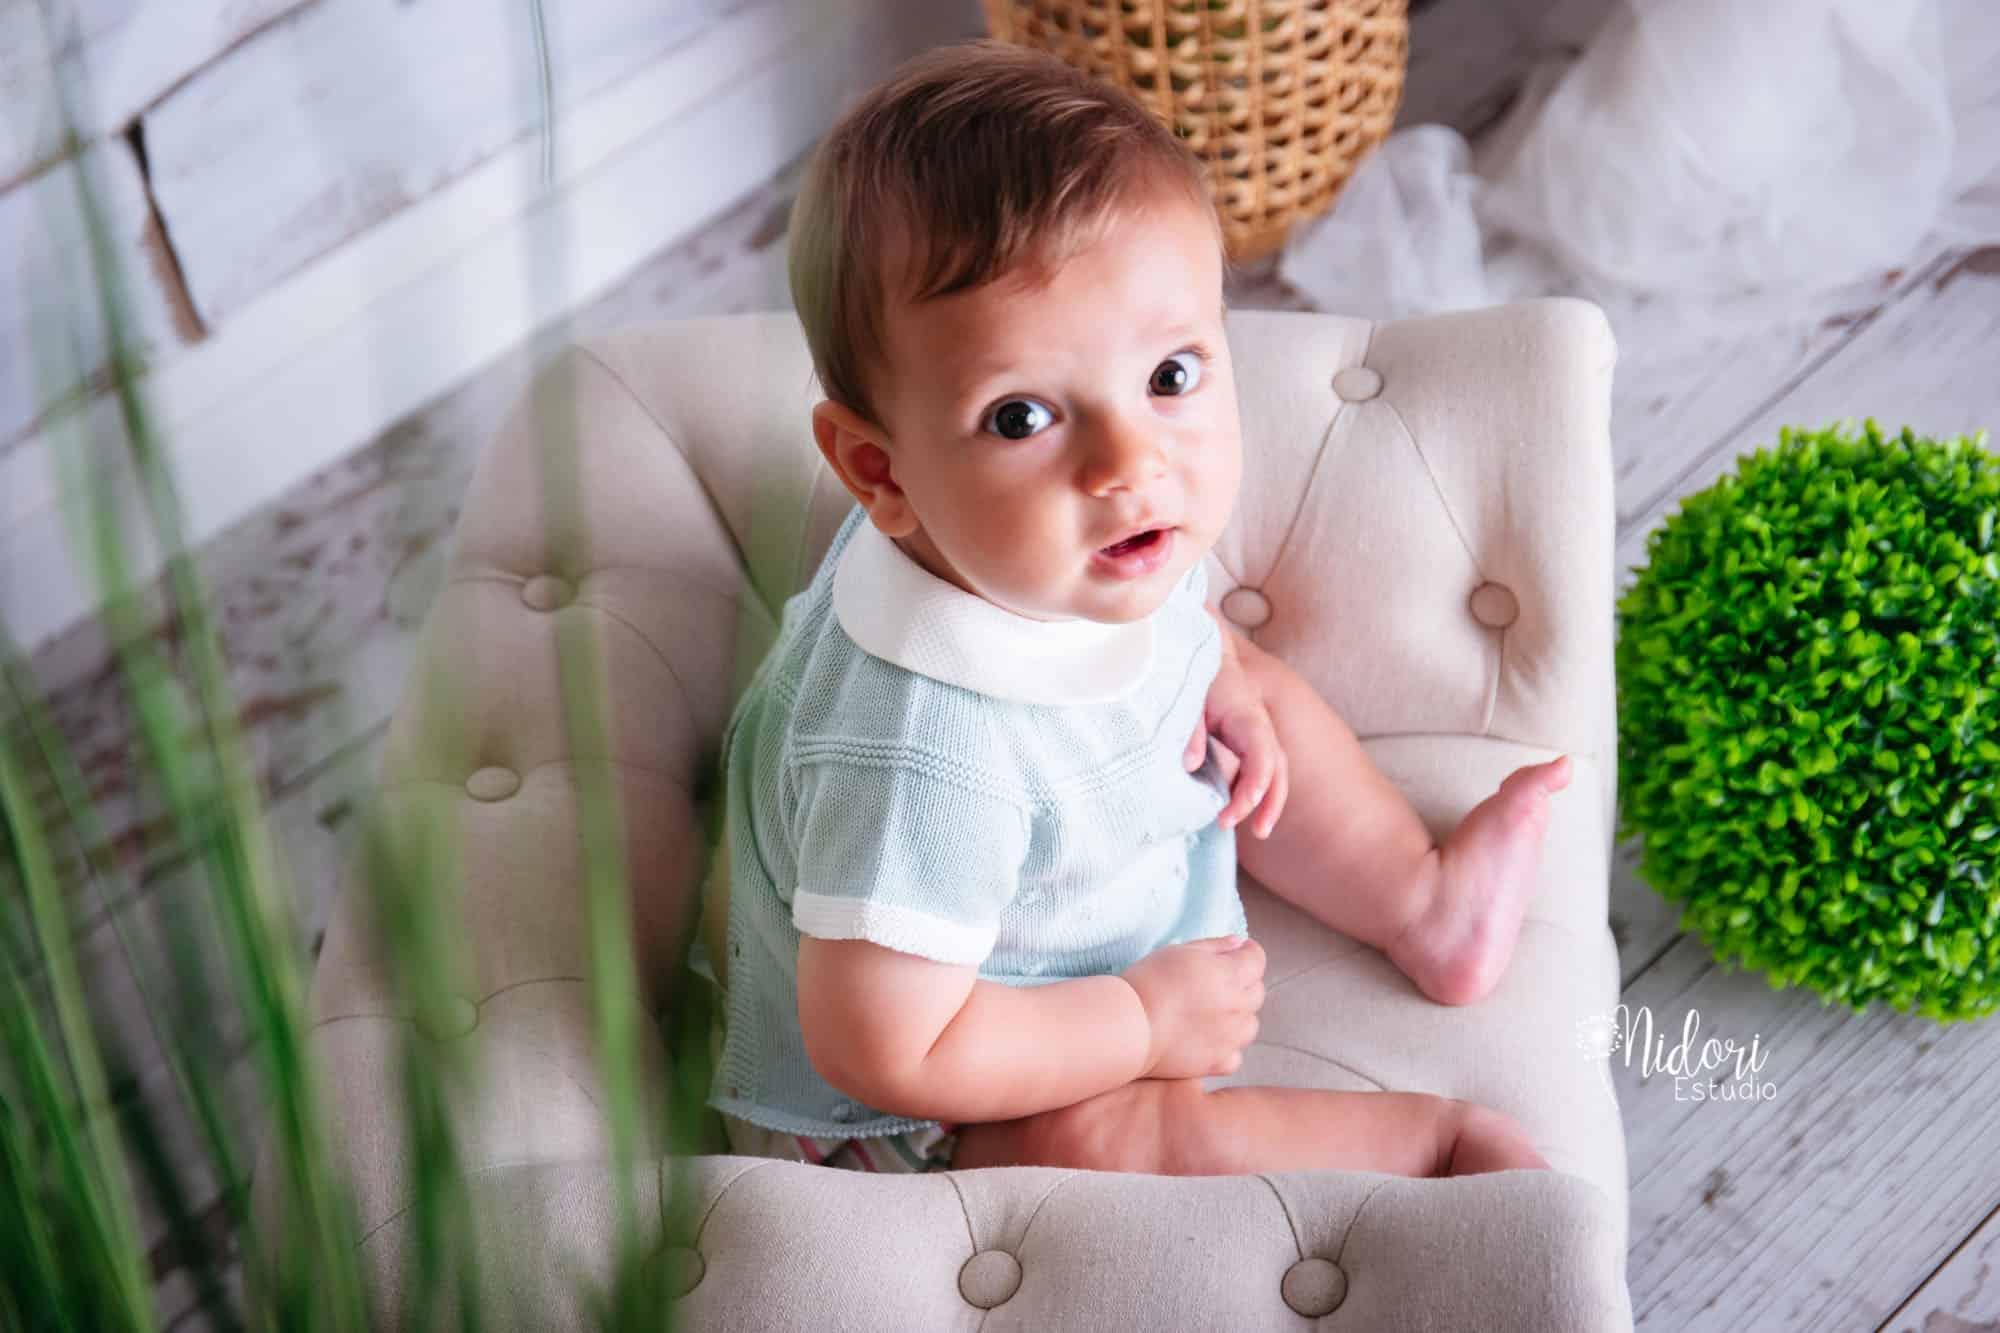 seguimiento-fotografia-niños-bebes-nidoriestudio-fotos-valencia-almazora-castellon-españa-spain-21